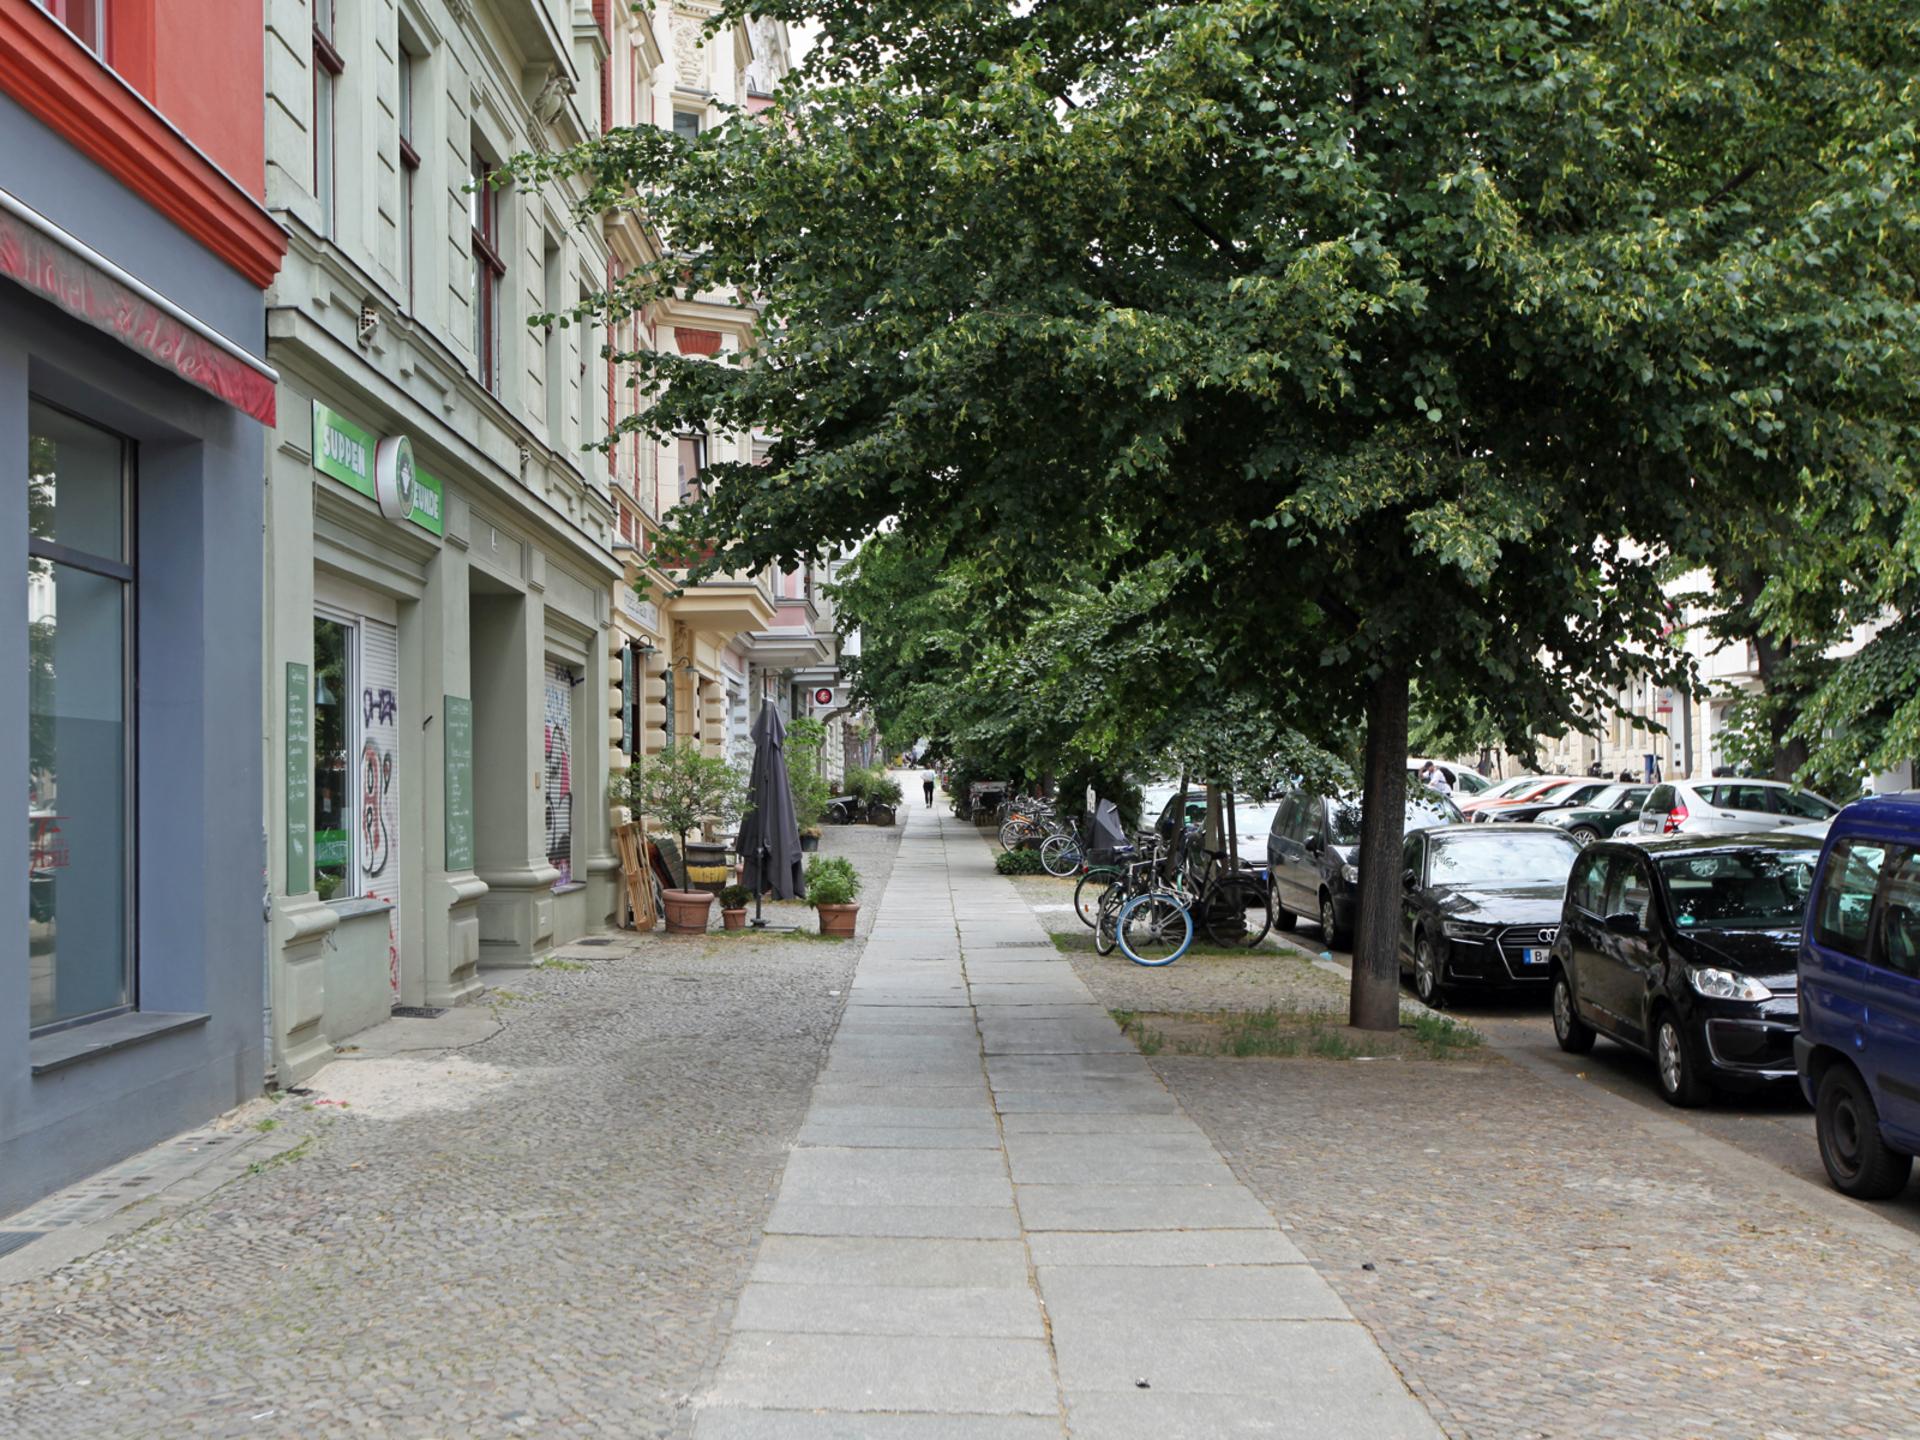 Winskiez | Greifswalder Straße